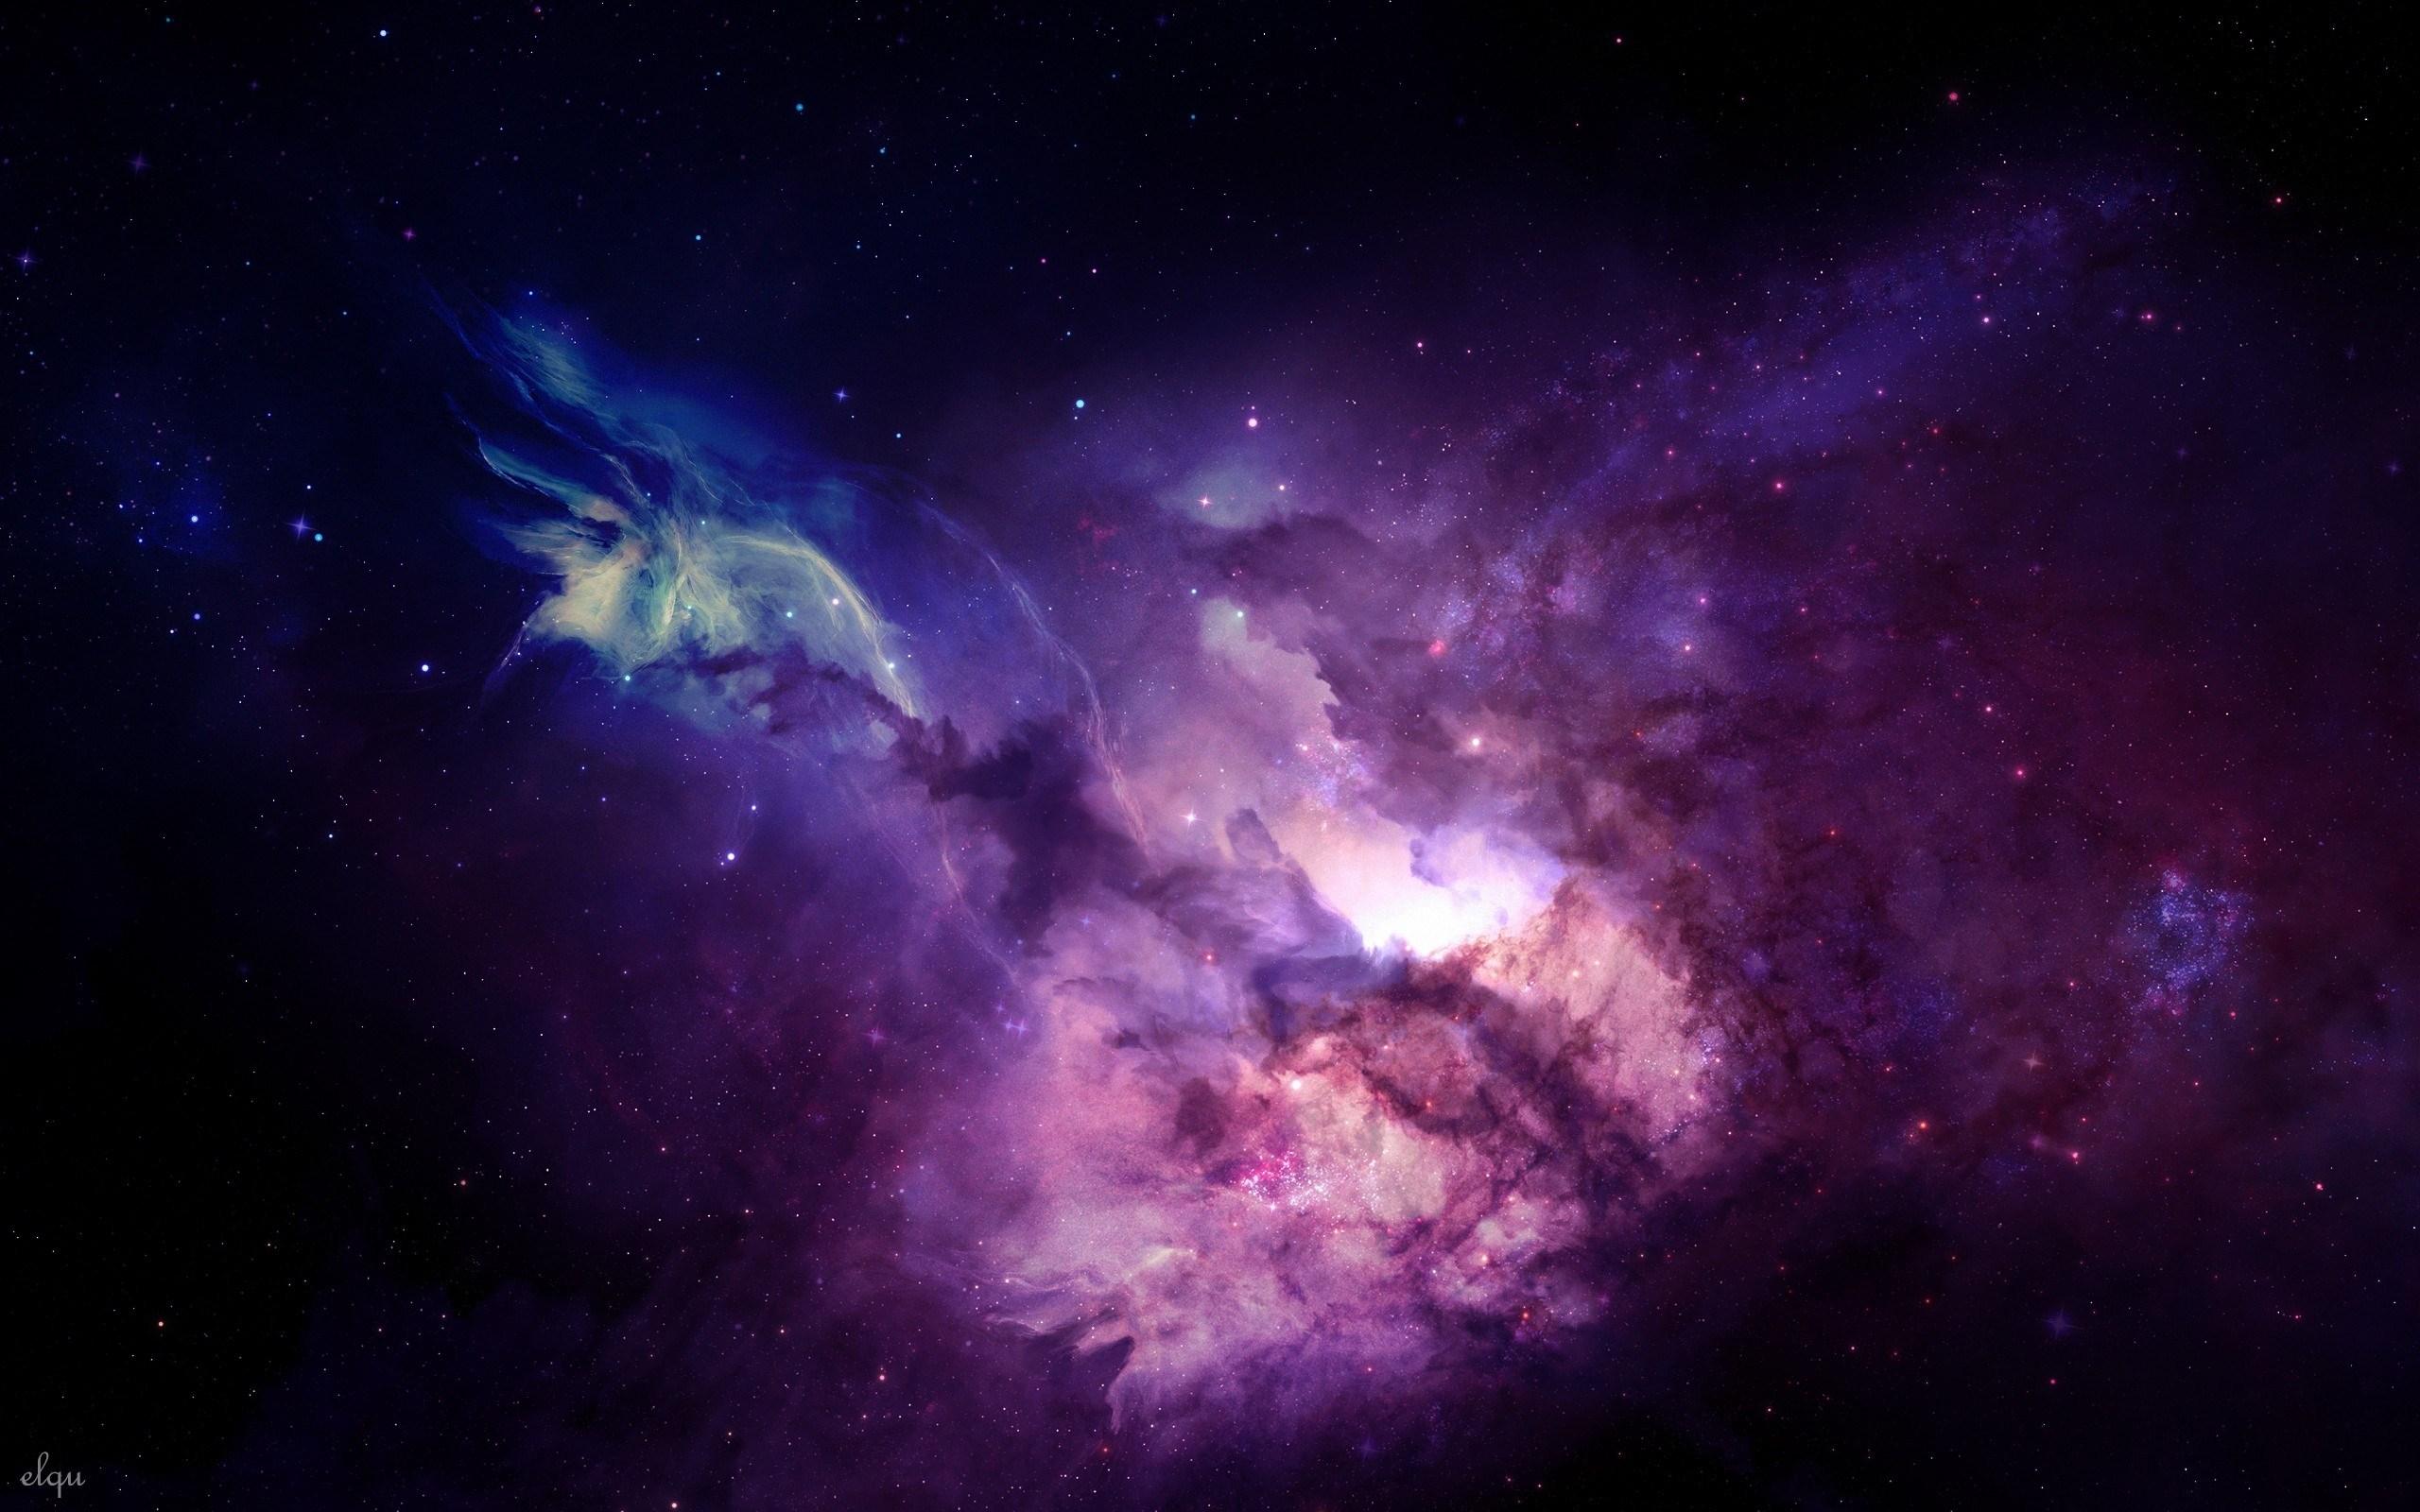 Flight Space Sky Wallpaper 2560x1600 340x220